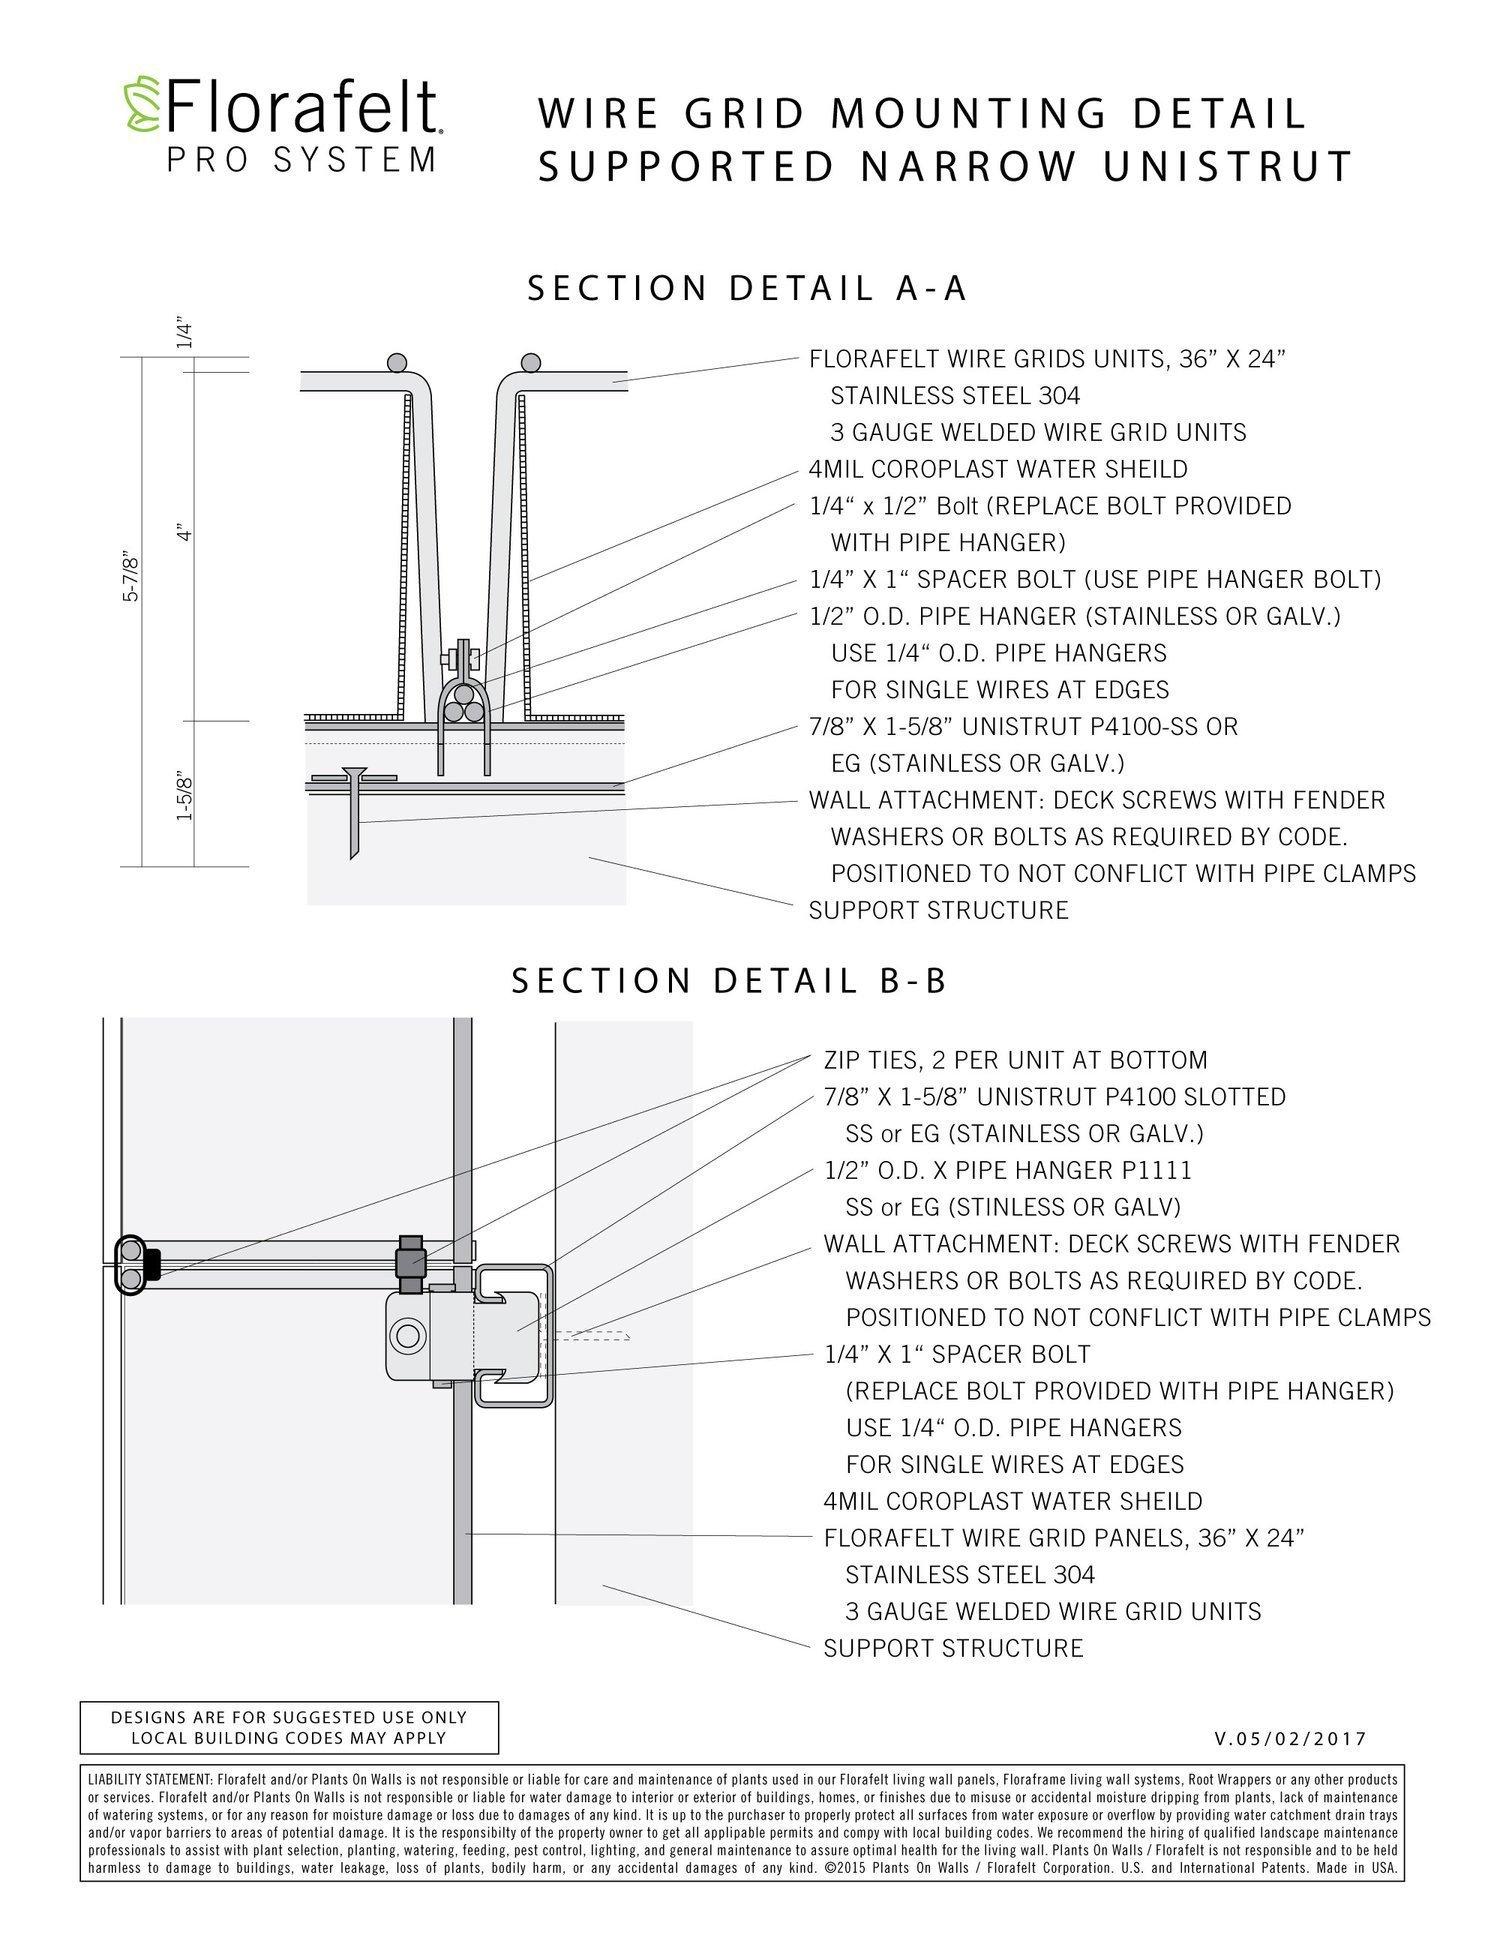 2 wire inter system 4 way florafelt pro grid mounting